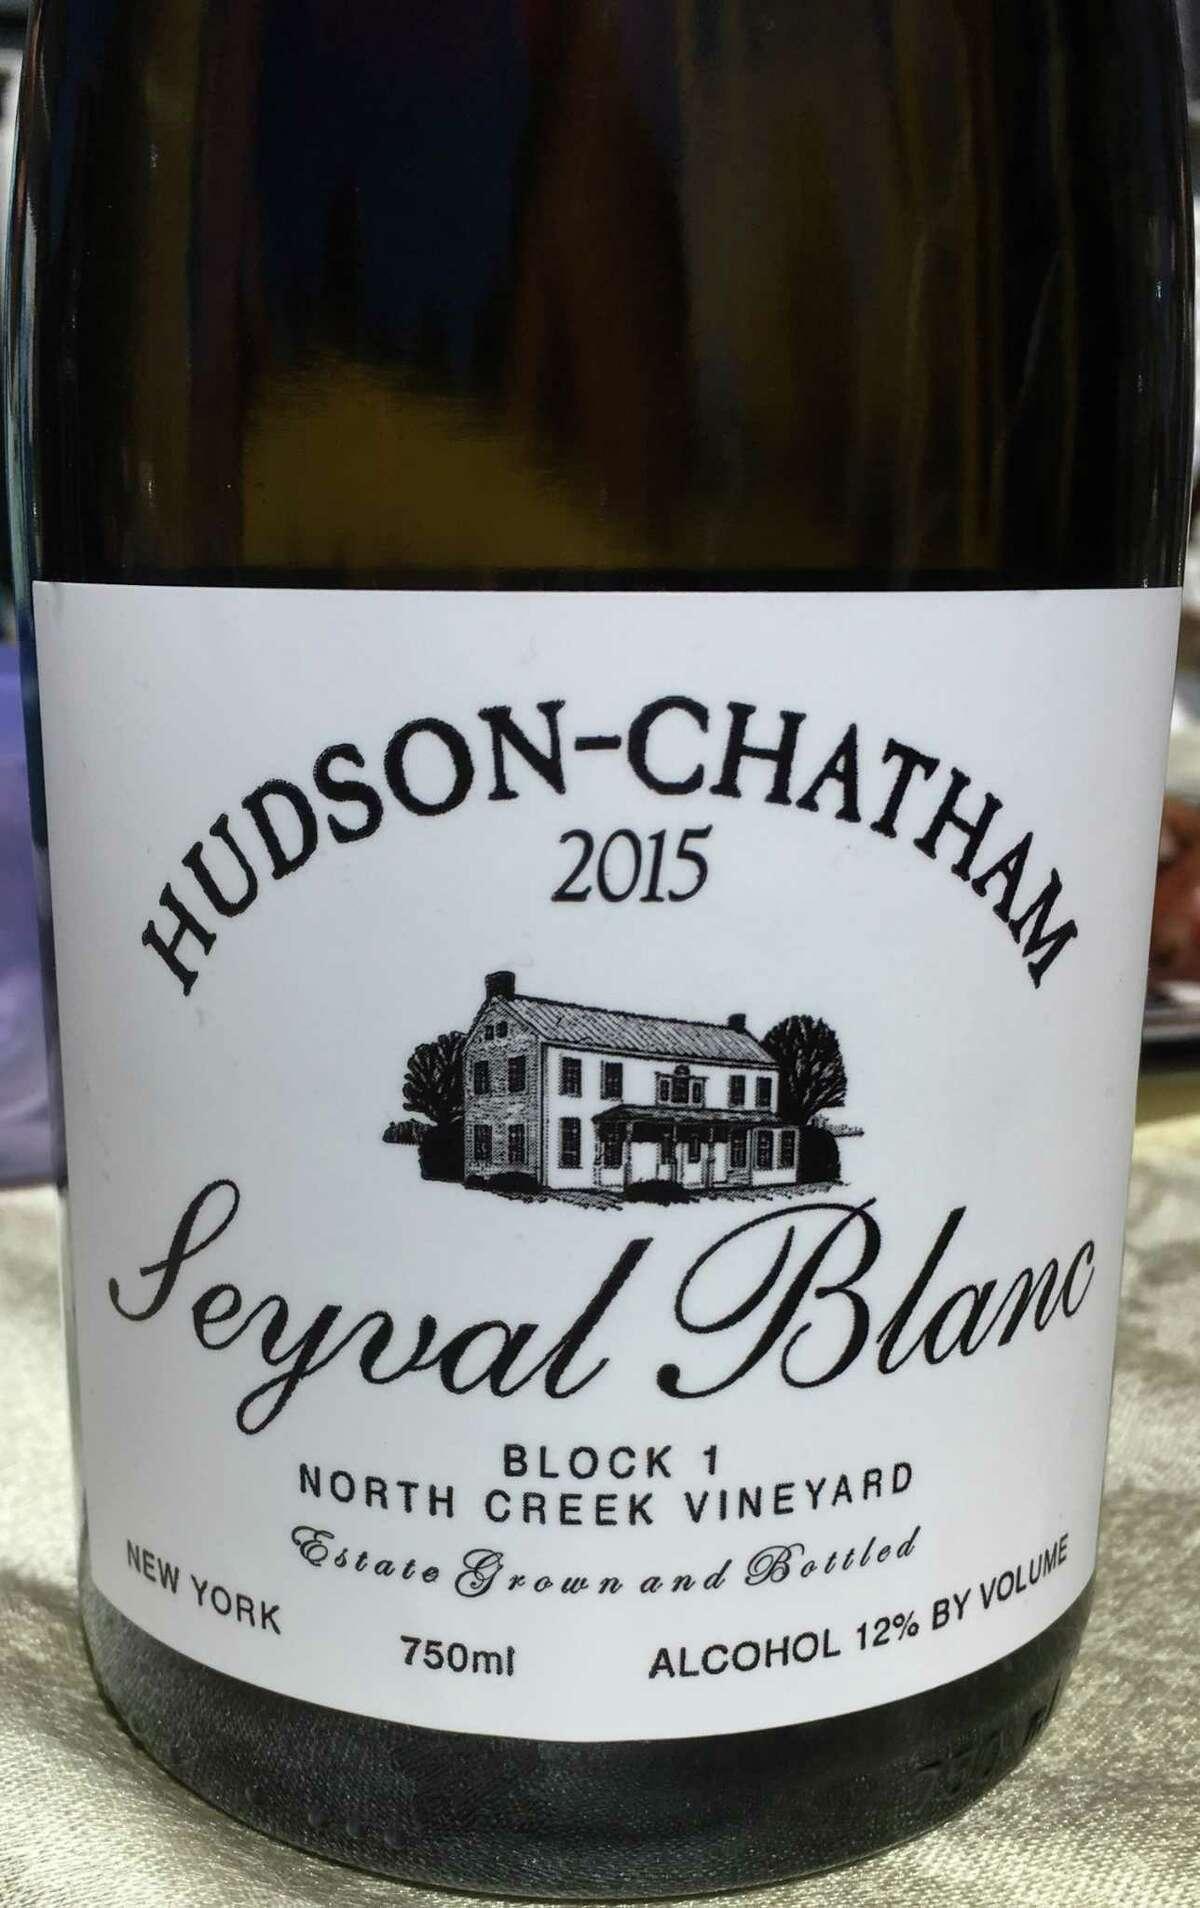 Hudson-Chatham Winery's seyval blanc